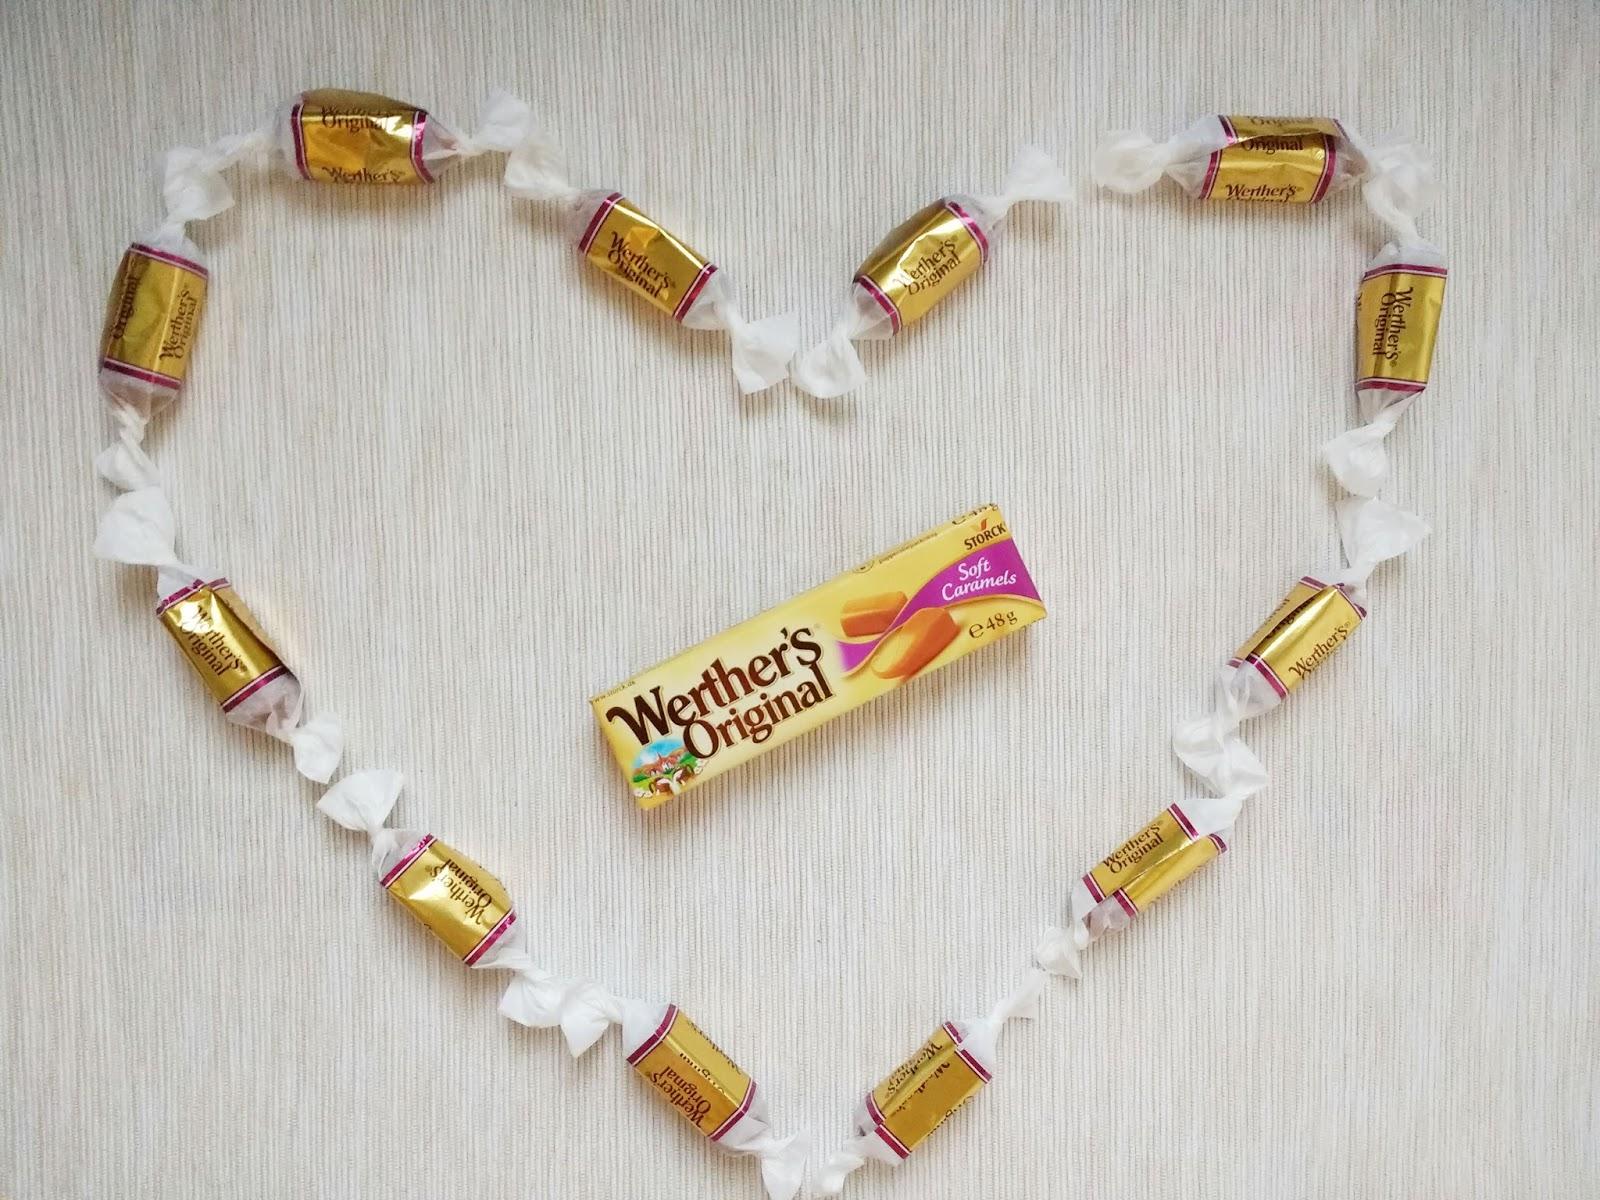 Werther's(owe) LOVE + Konkurs